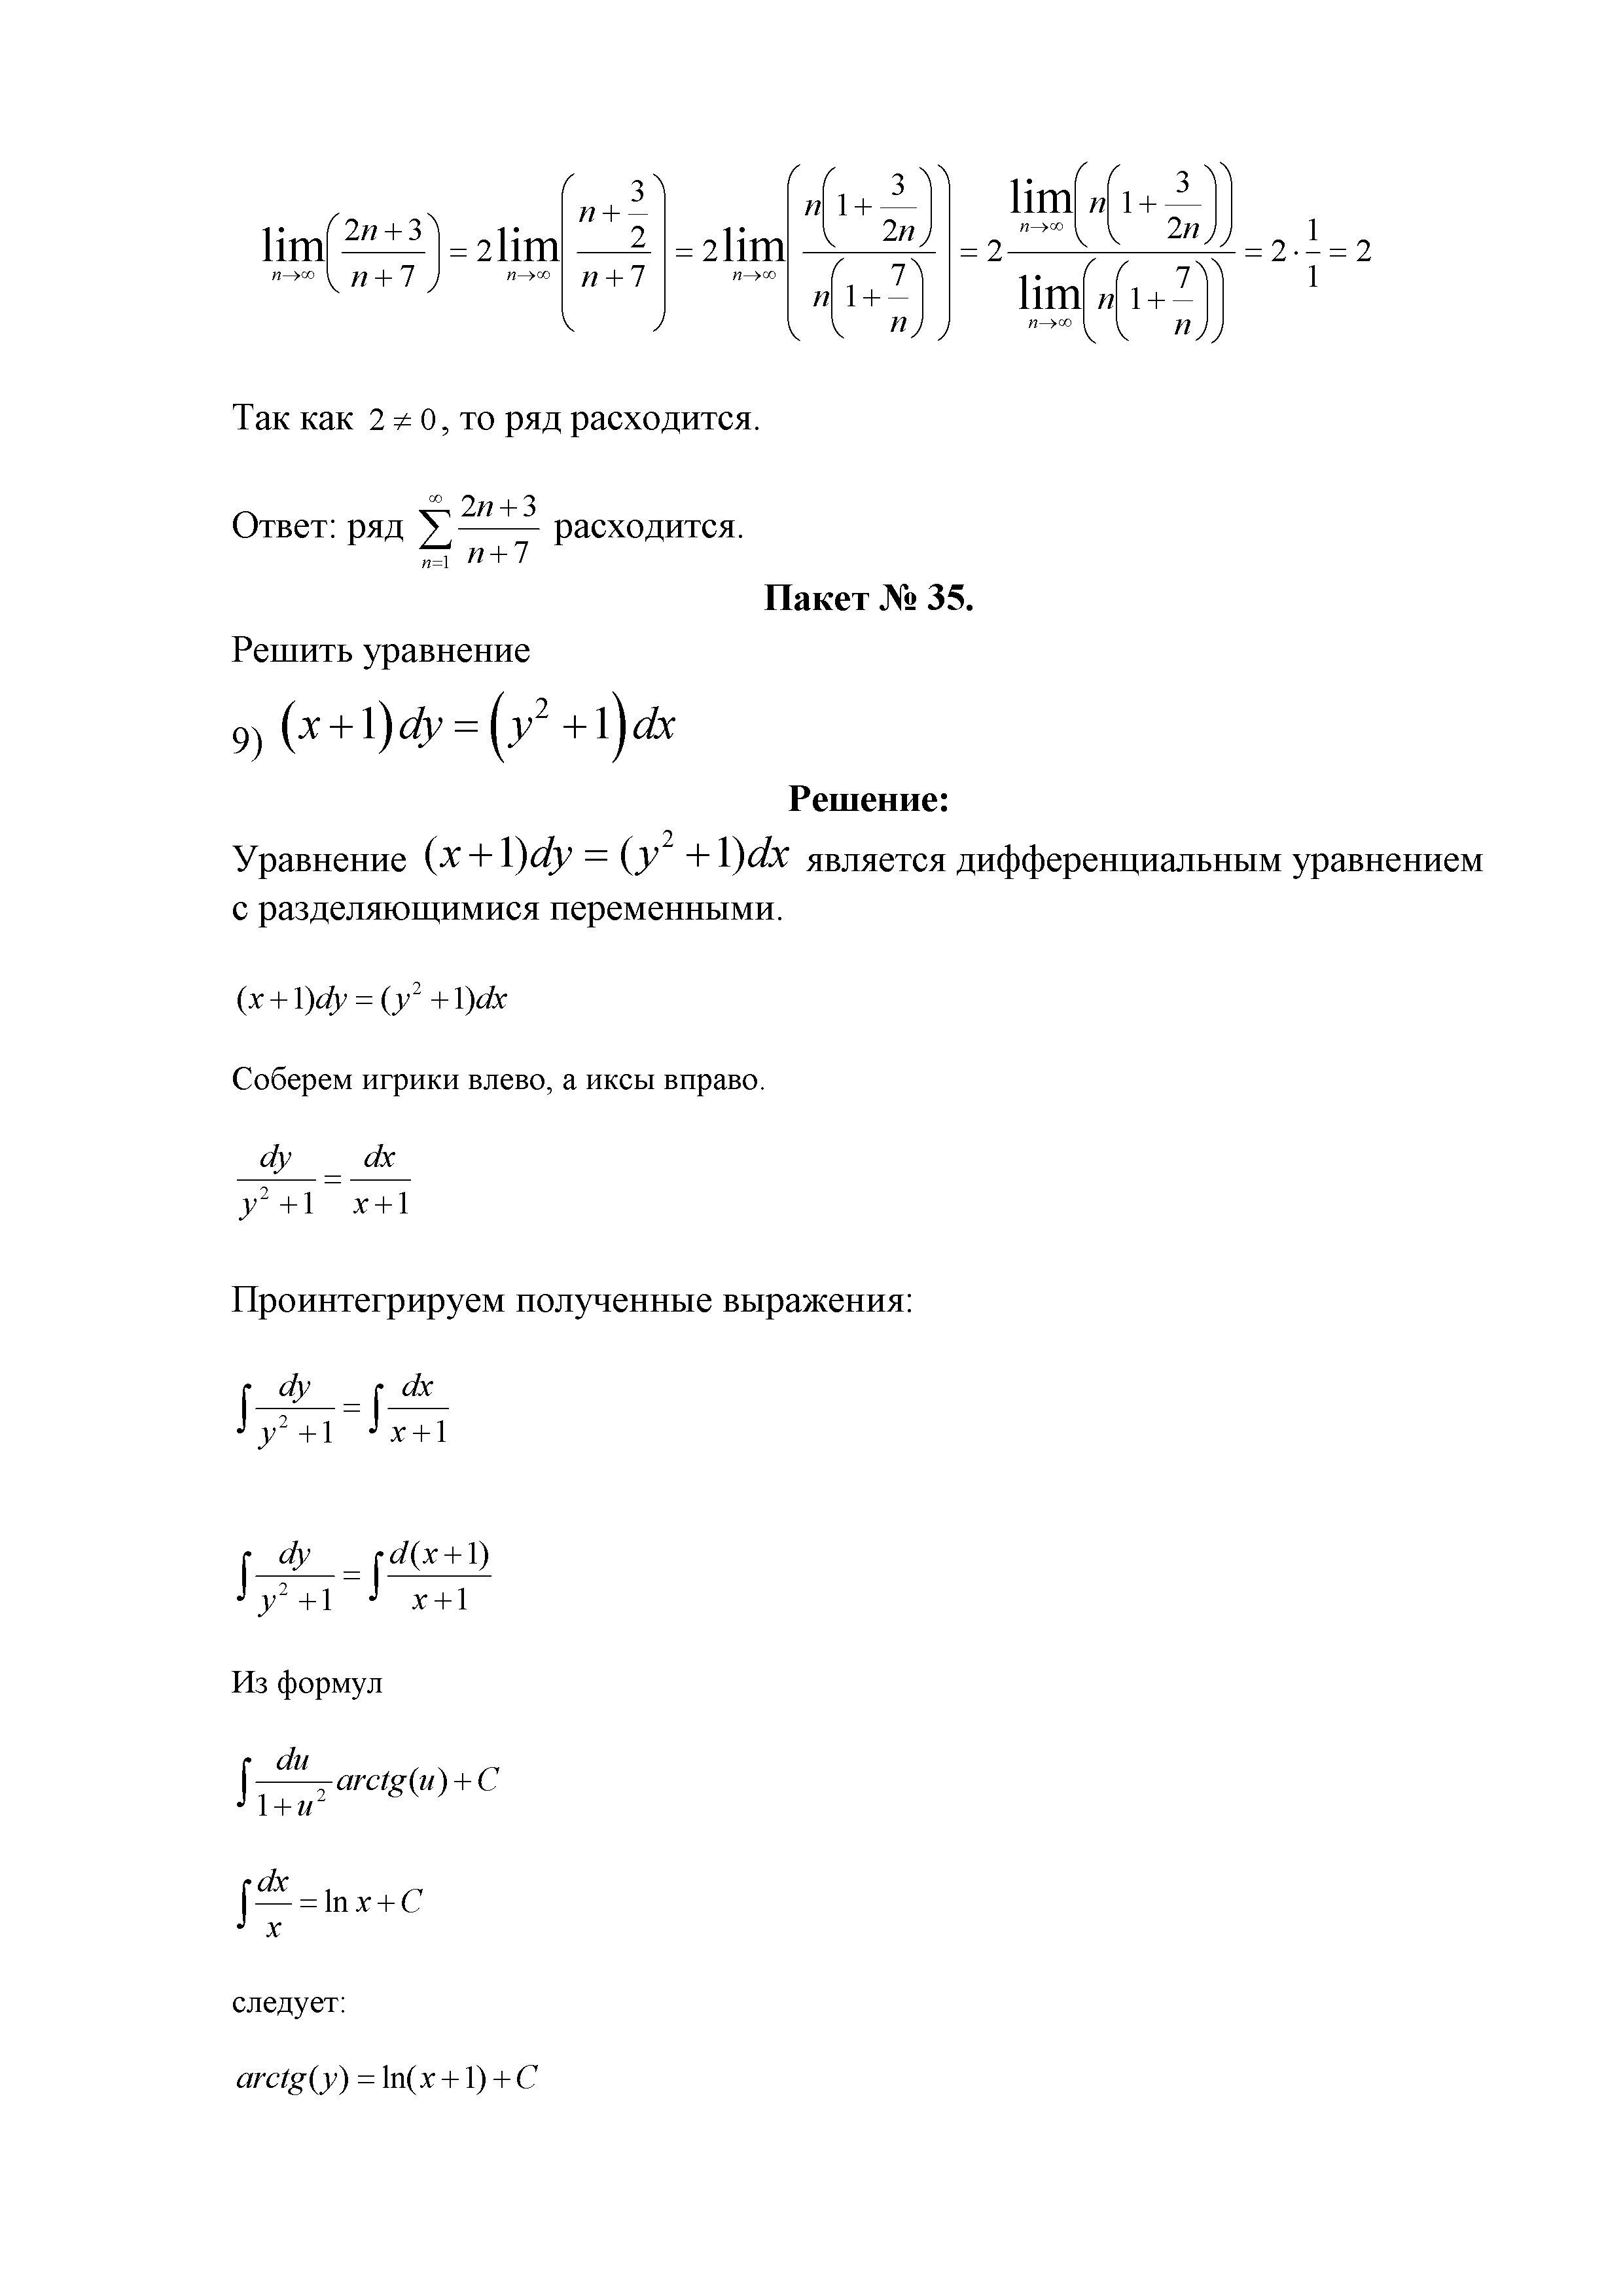 решебник задач по тмм 3 курс